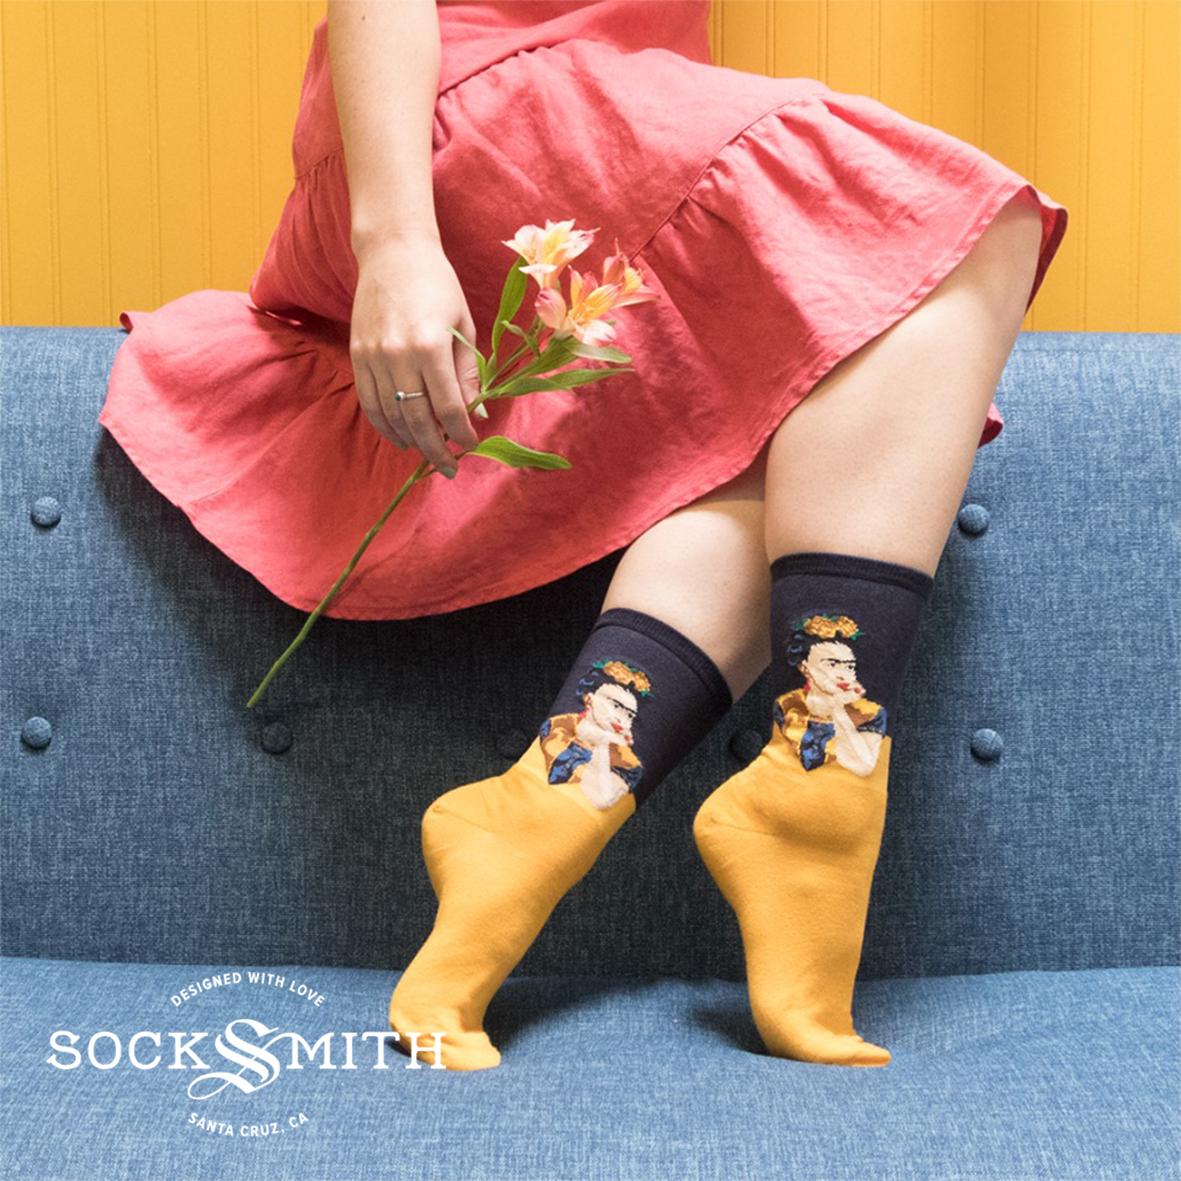 Socks Smith.jpg